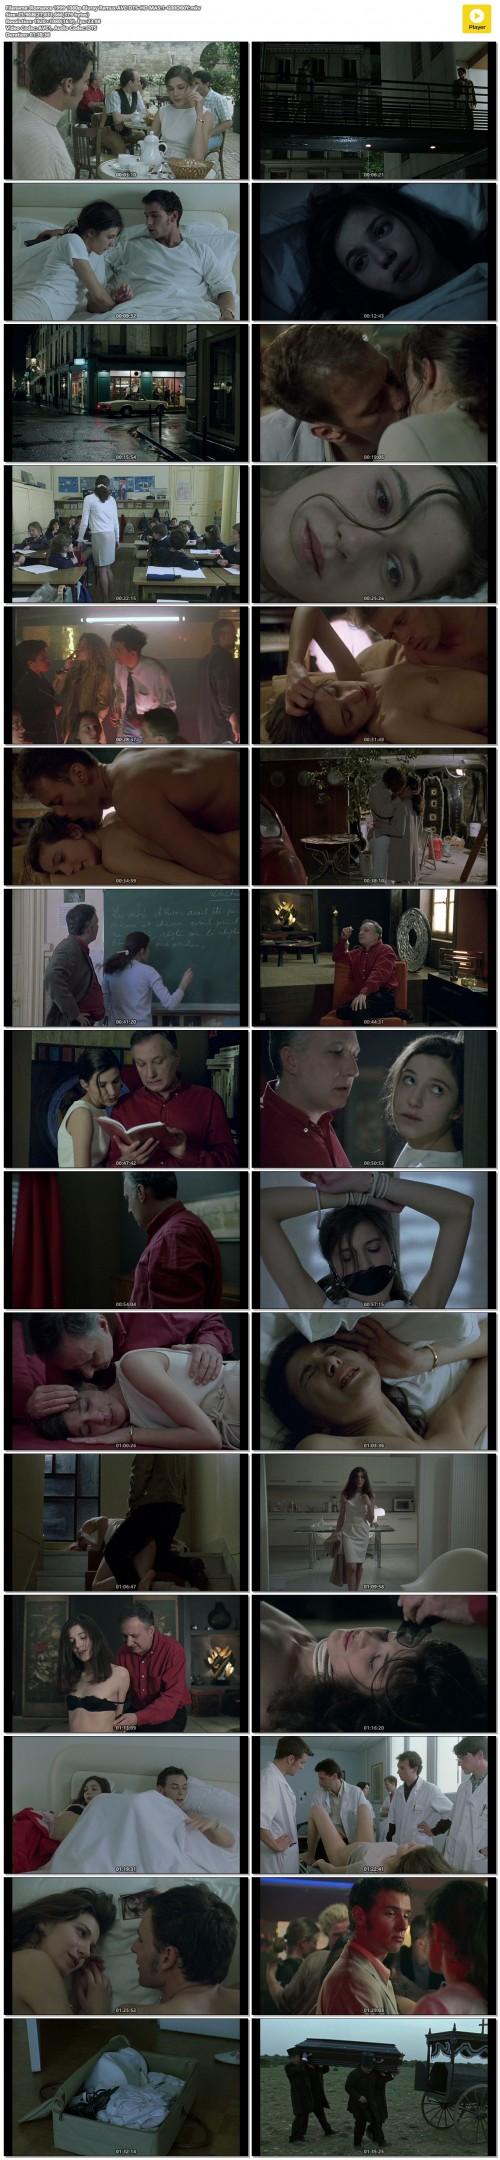 Romance-1999-1080p-Bluray-Remux-AVC-DTS-HD-MA5.1-G00DB0Y.mkv.jpg